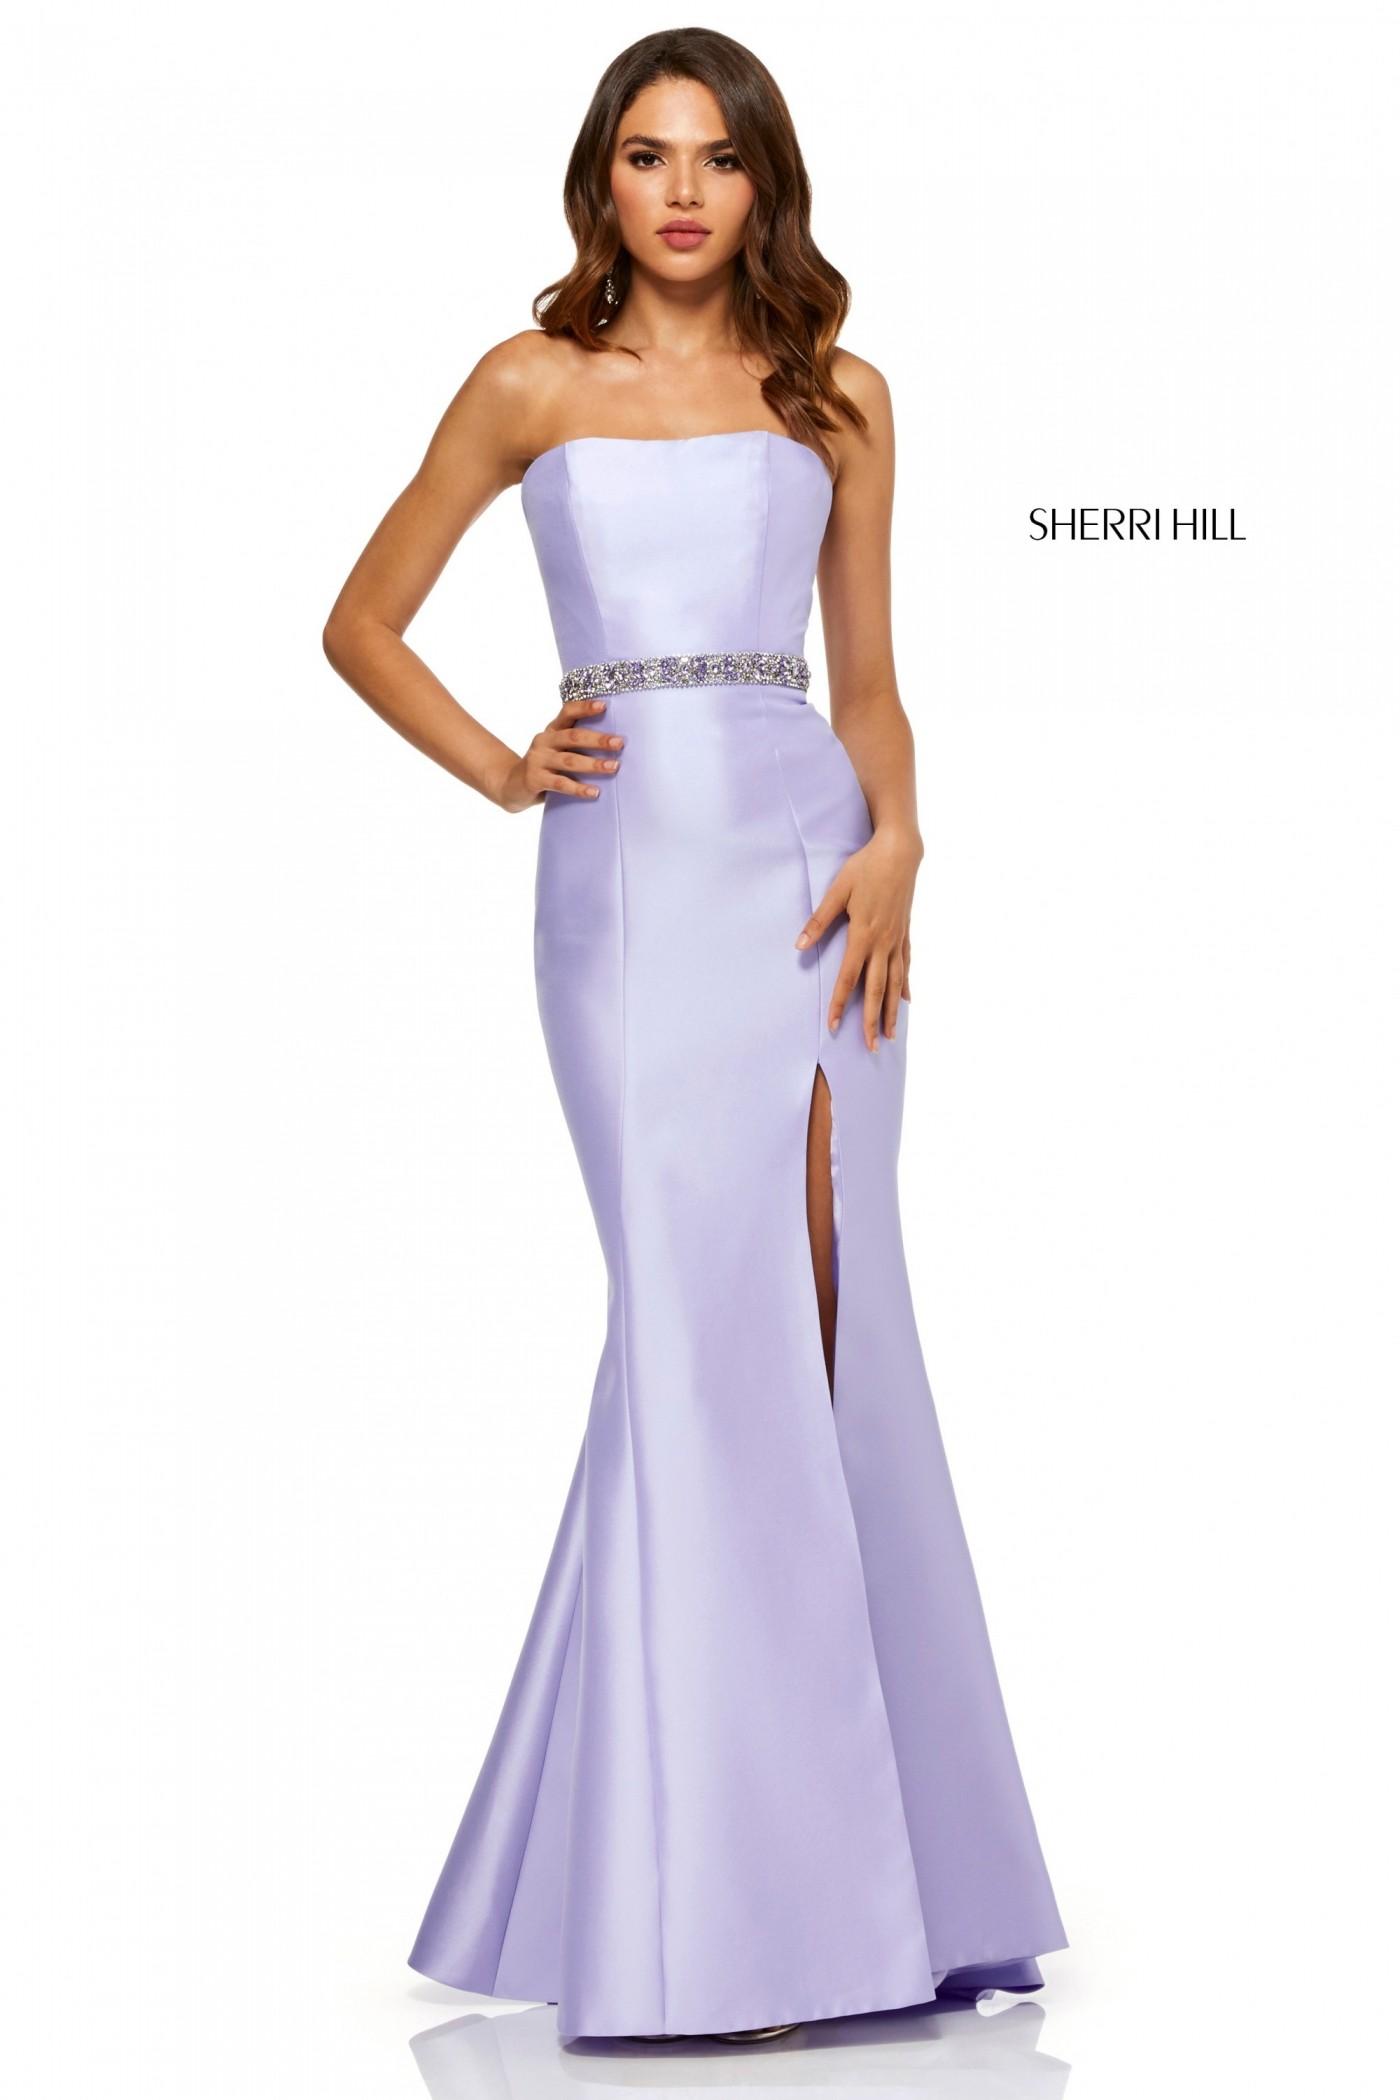 Sherri Hill 52541 Strapless Evening Gown